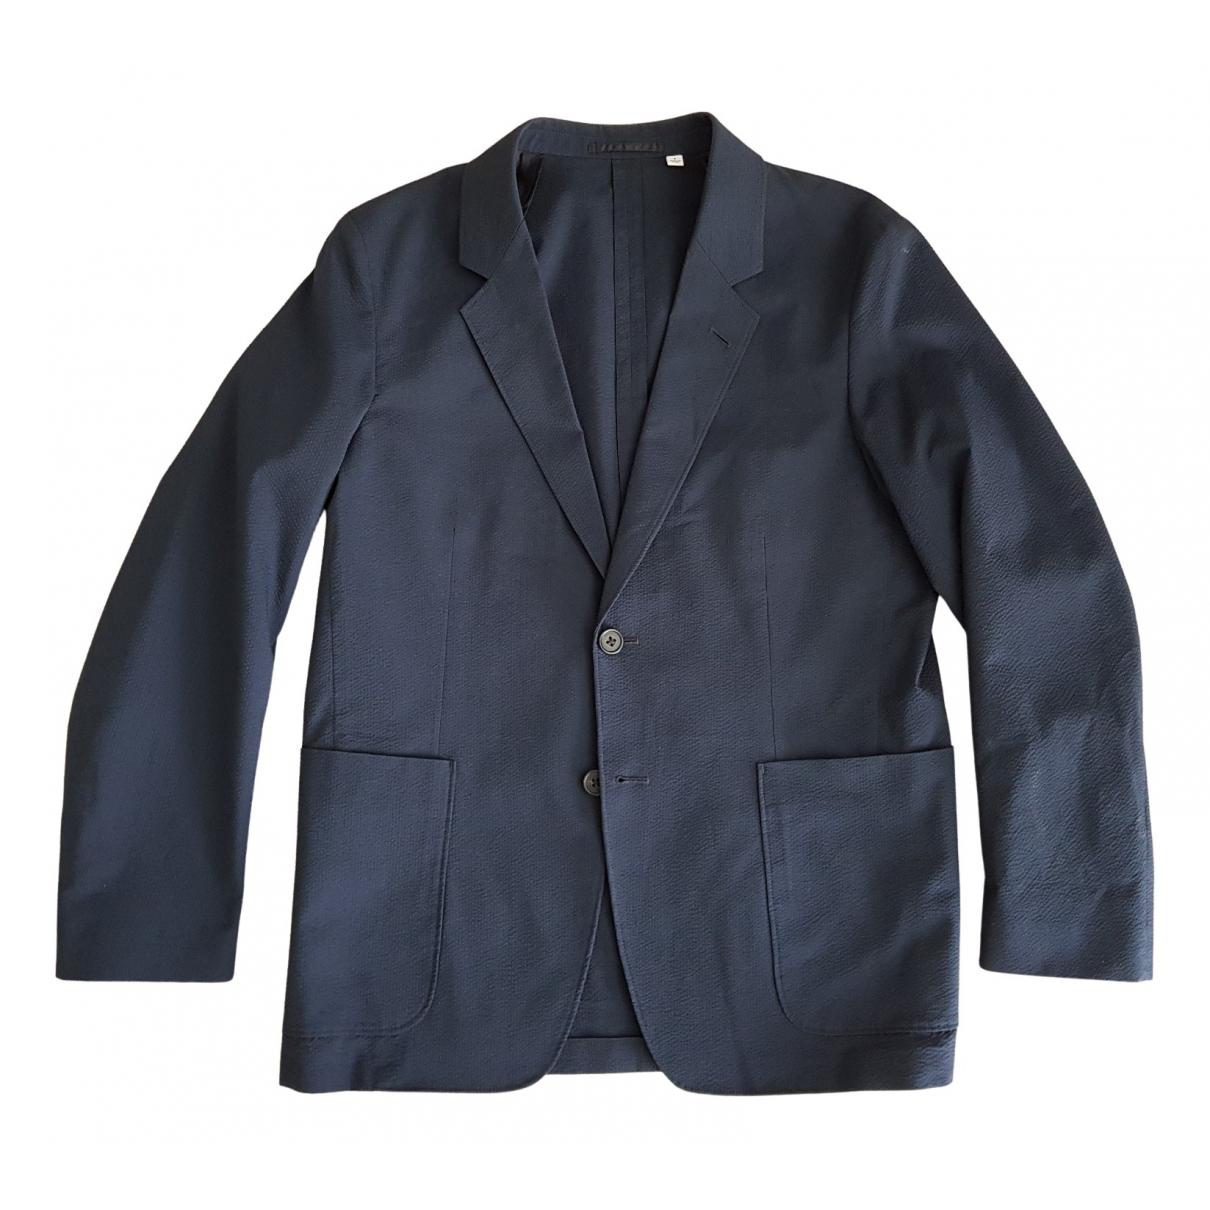 Uniqlo \N Navy Cotton jacket  for Men S International